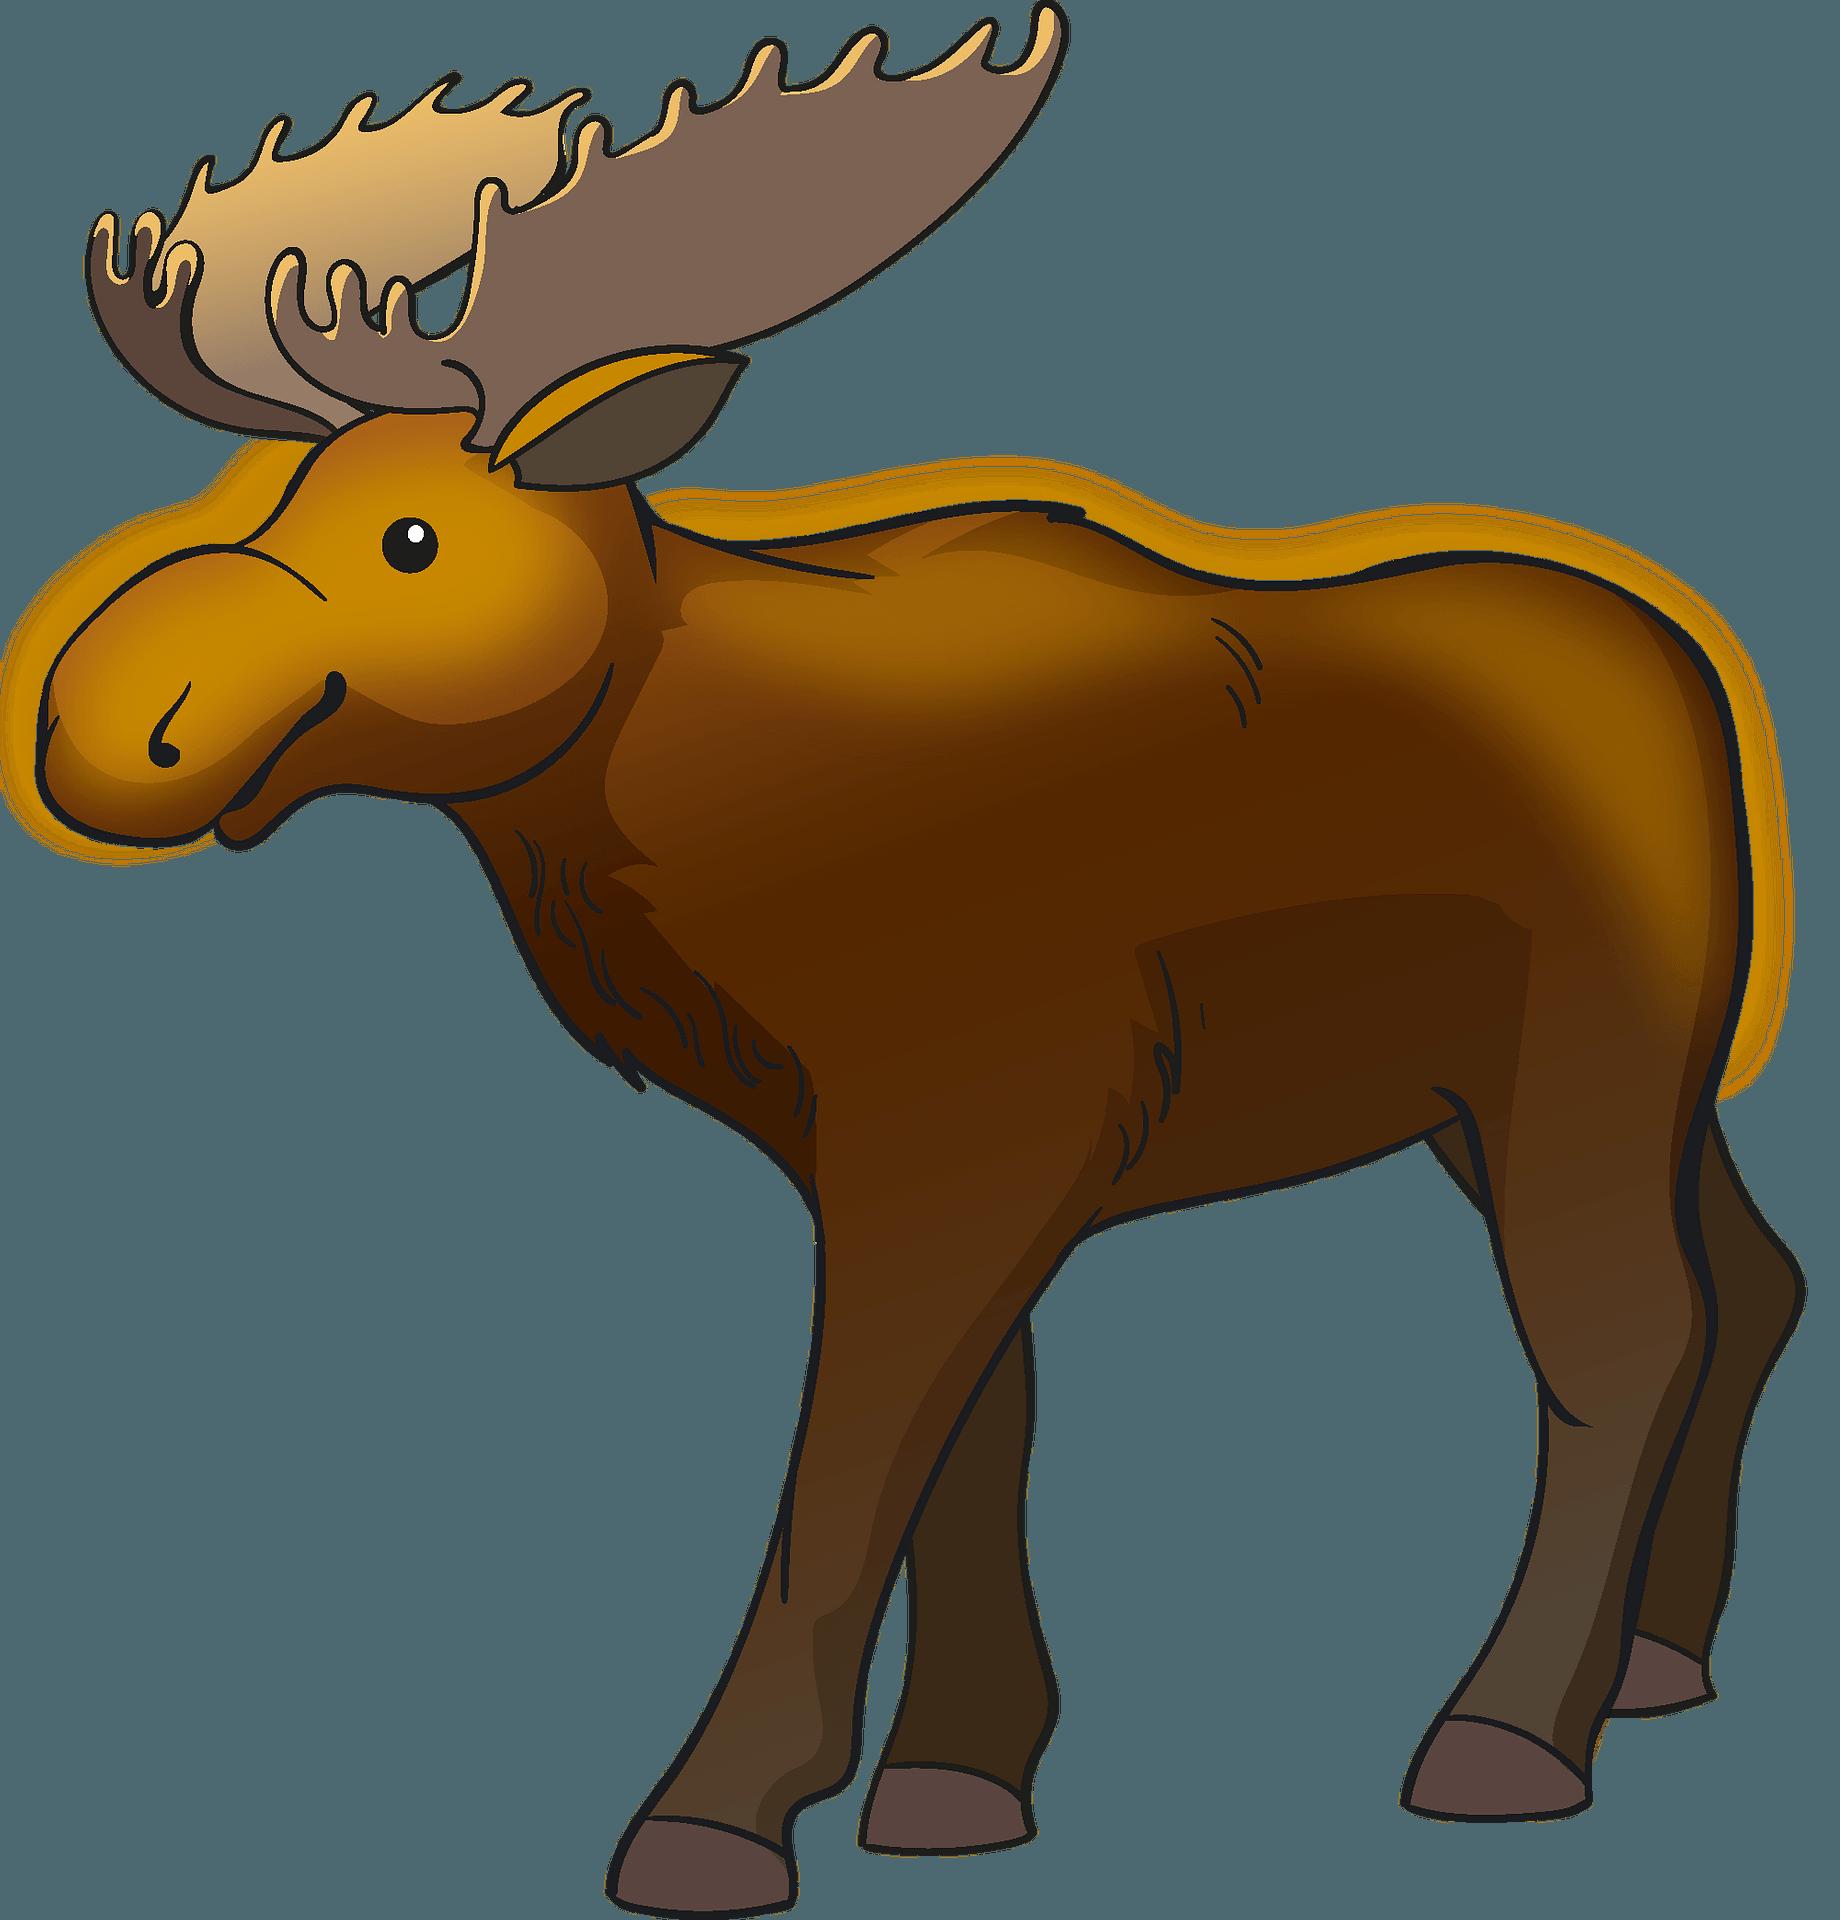 Cute moose clipart | ClipartMonk - Free Clip Art Images